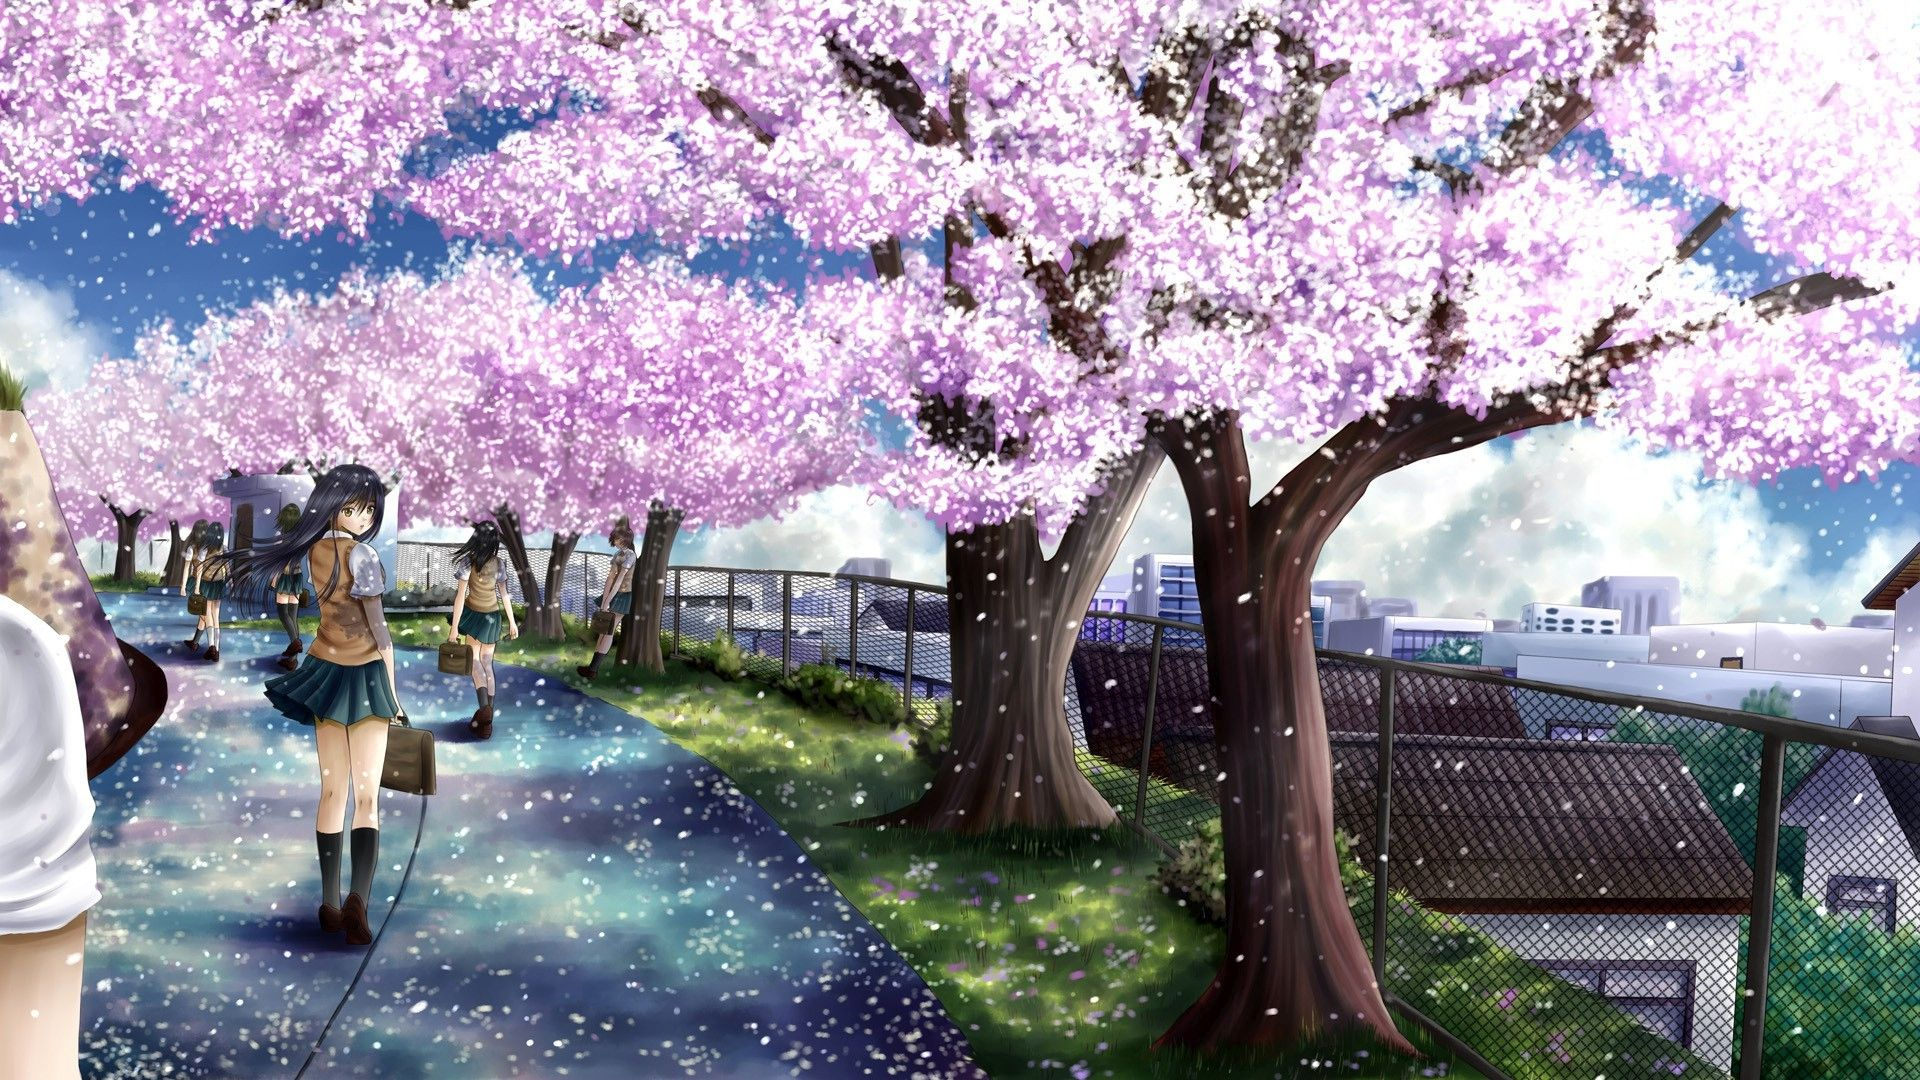 sakura tree gif Buscar con Google Latar belakang